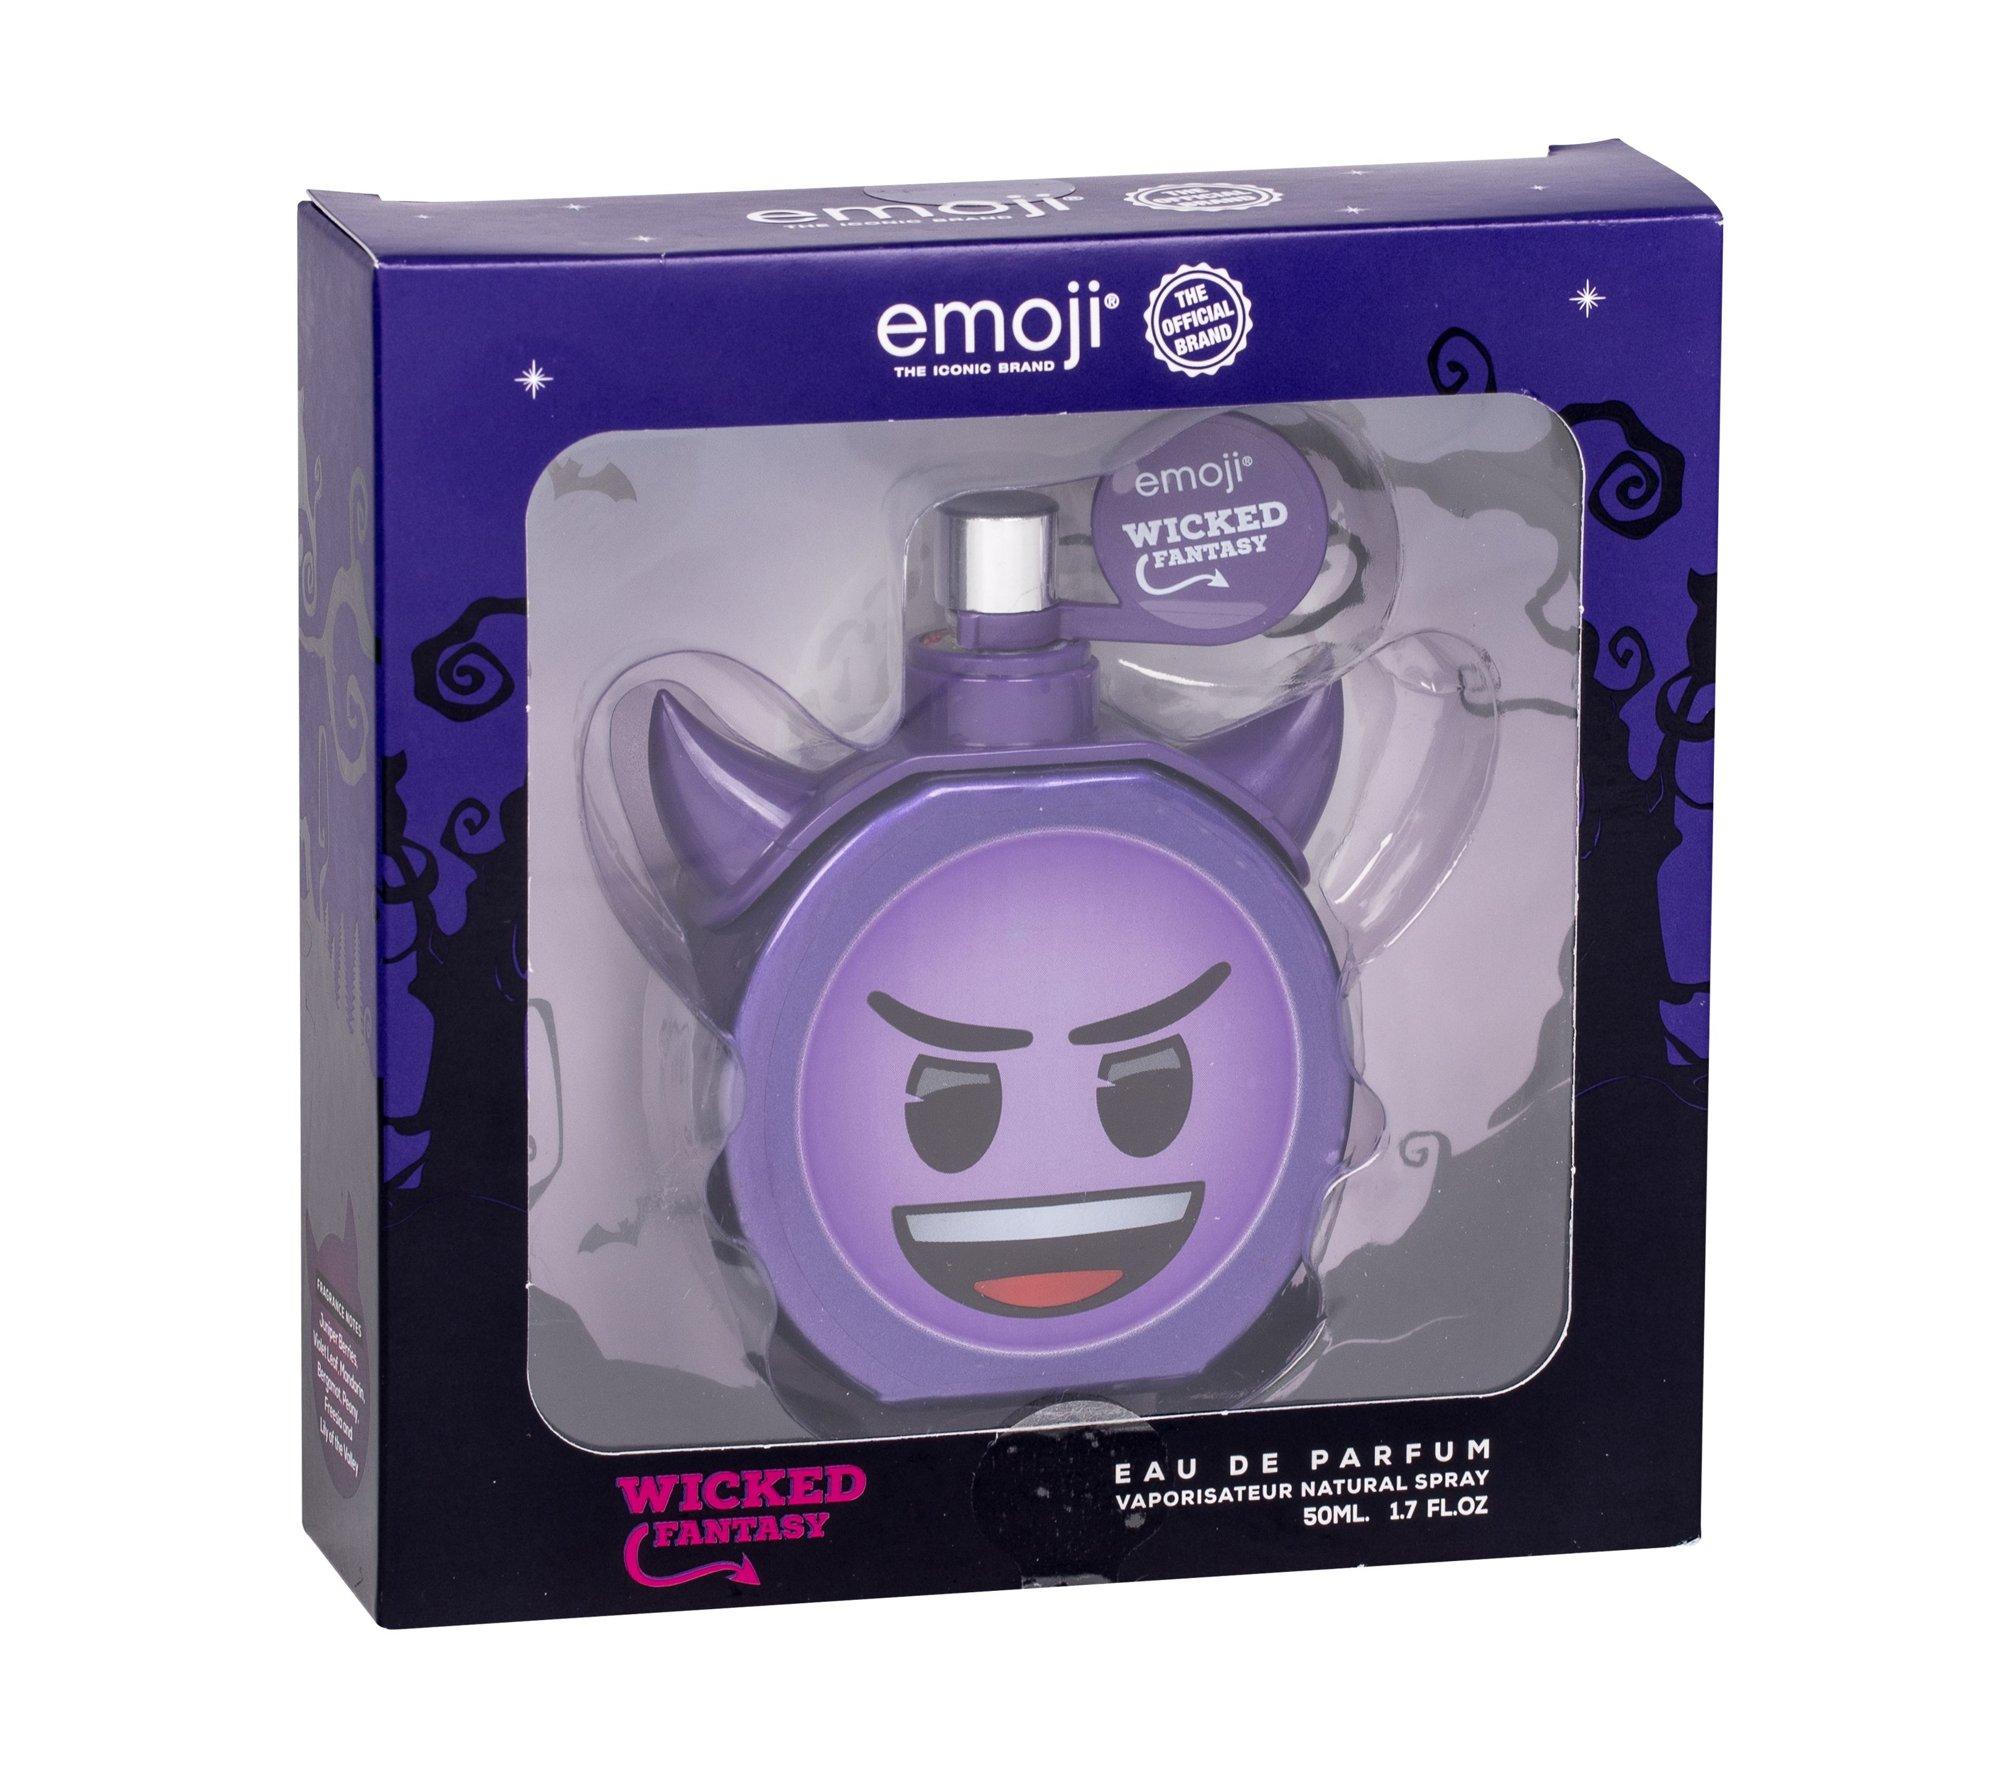 Emoji Wicked Fantasy